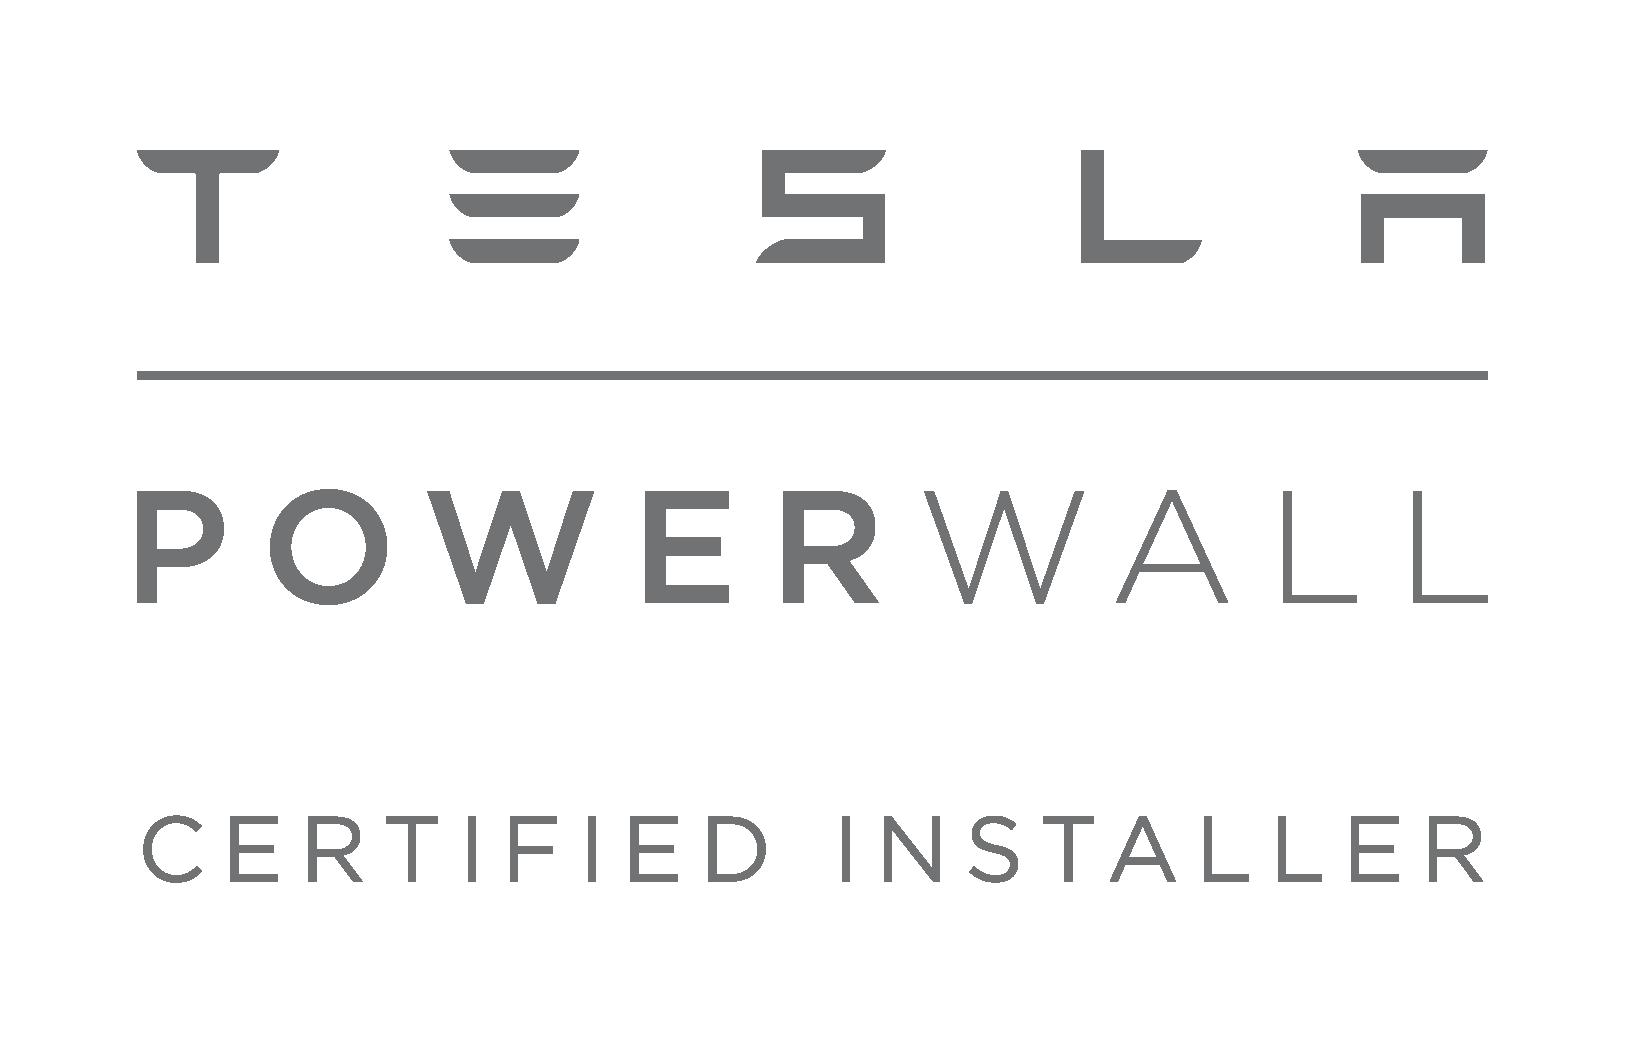 Powerwall Certified Installer Logo